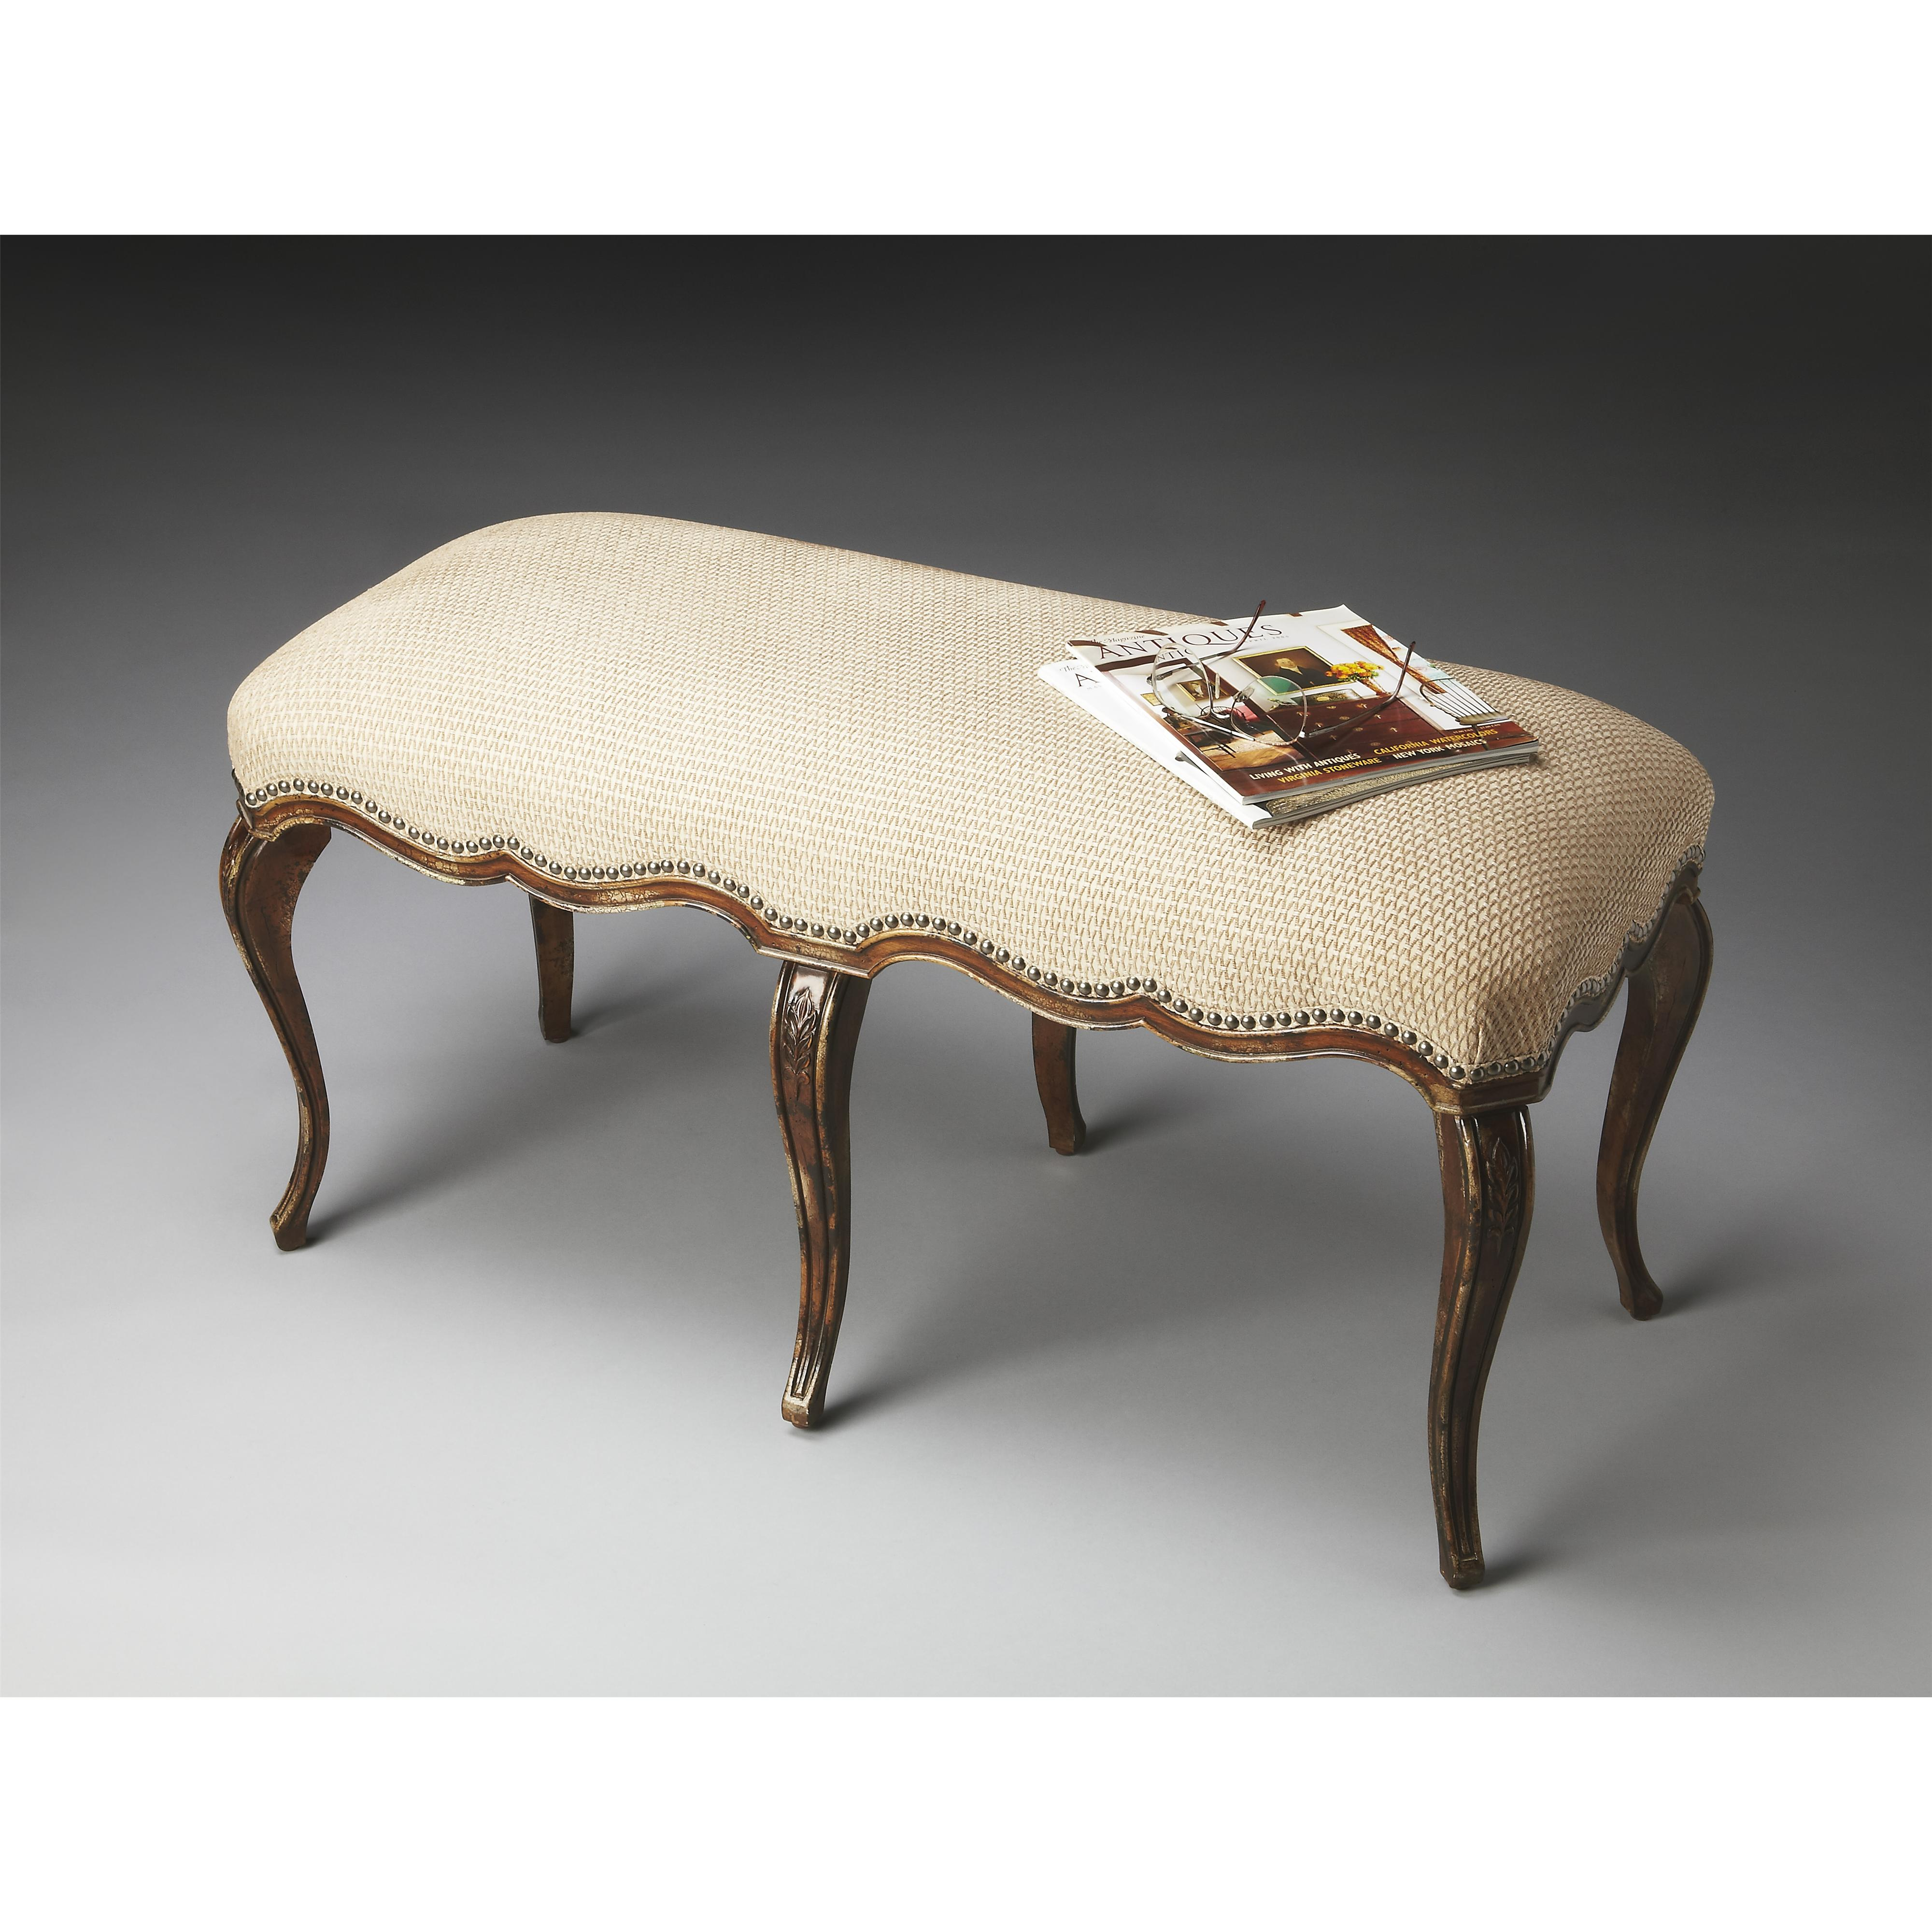 Butler Specialty Company Artist's Originals Bench - Item Number: 2902228